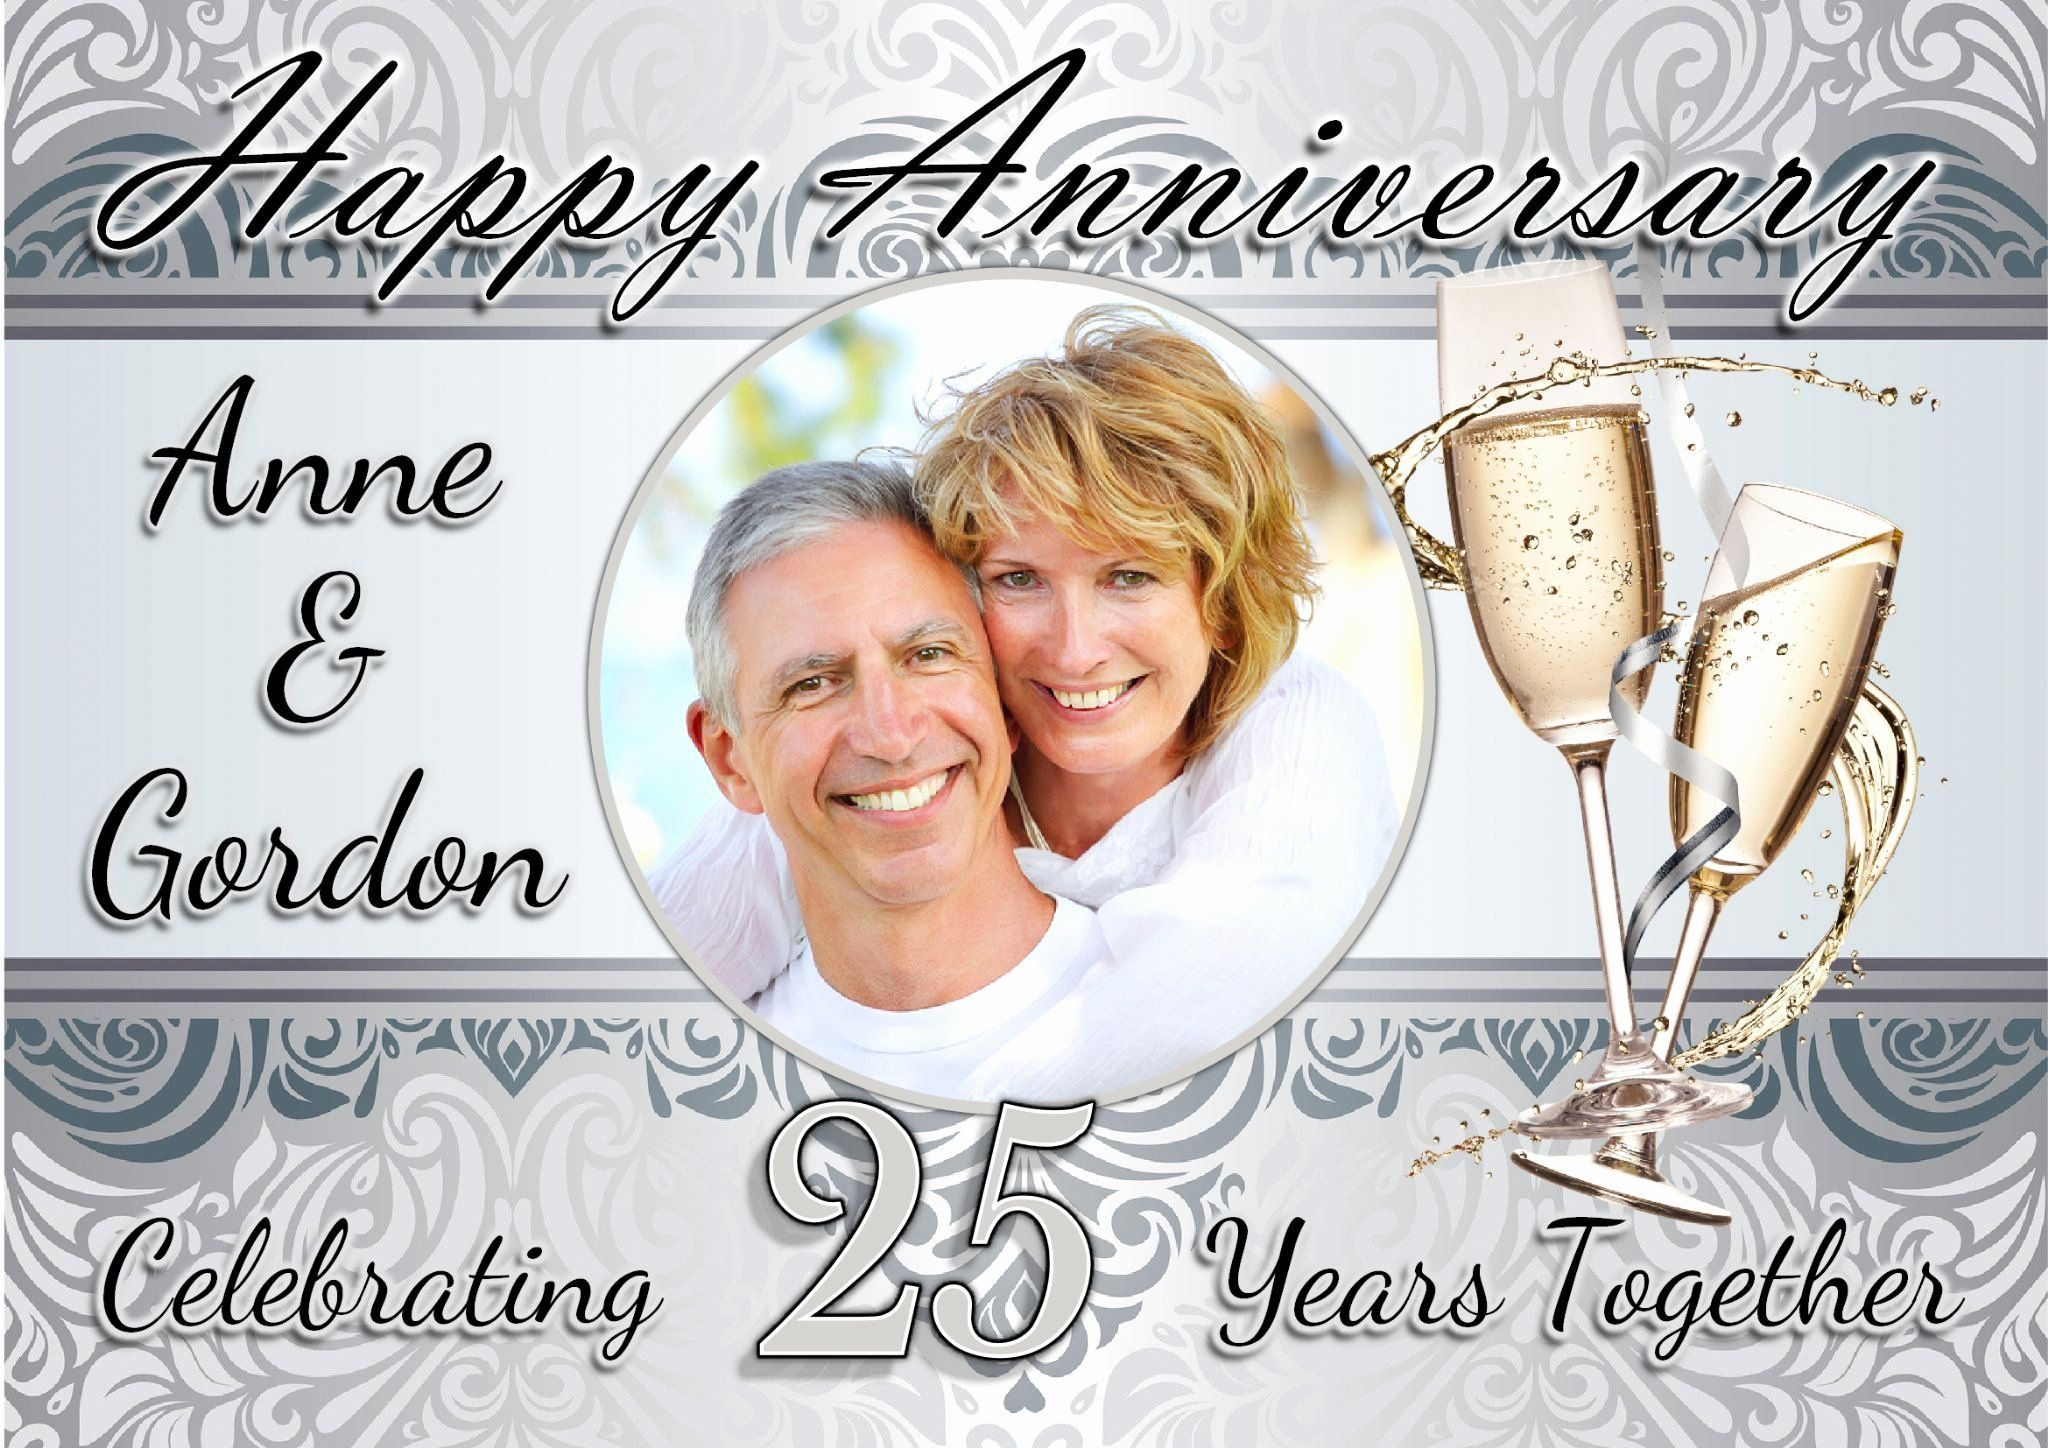 25th Wedding Anniversary Invitations Templates Elegant 25th Wed Wedding Anniversary Invitations 25th Wedding Anniversary Invitations Silver Wedding Anniversary